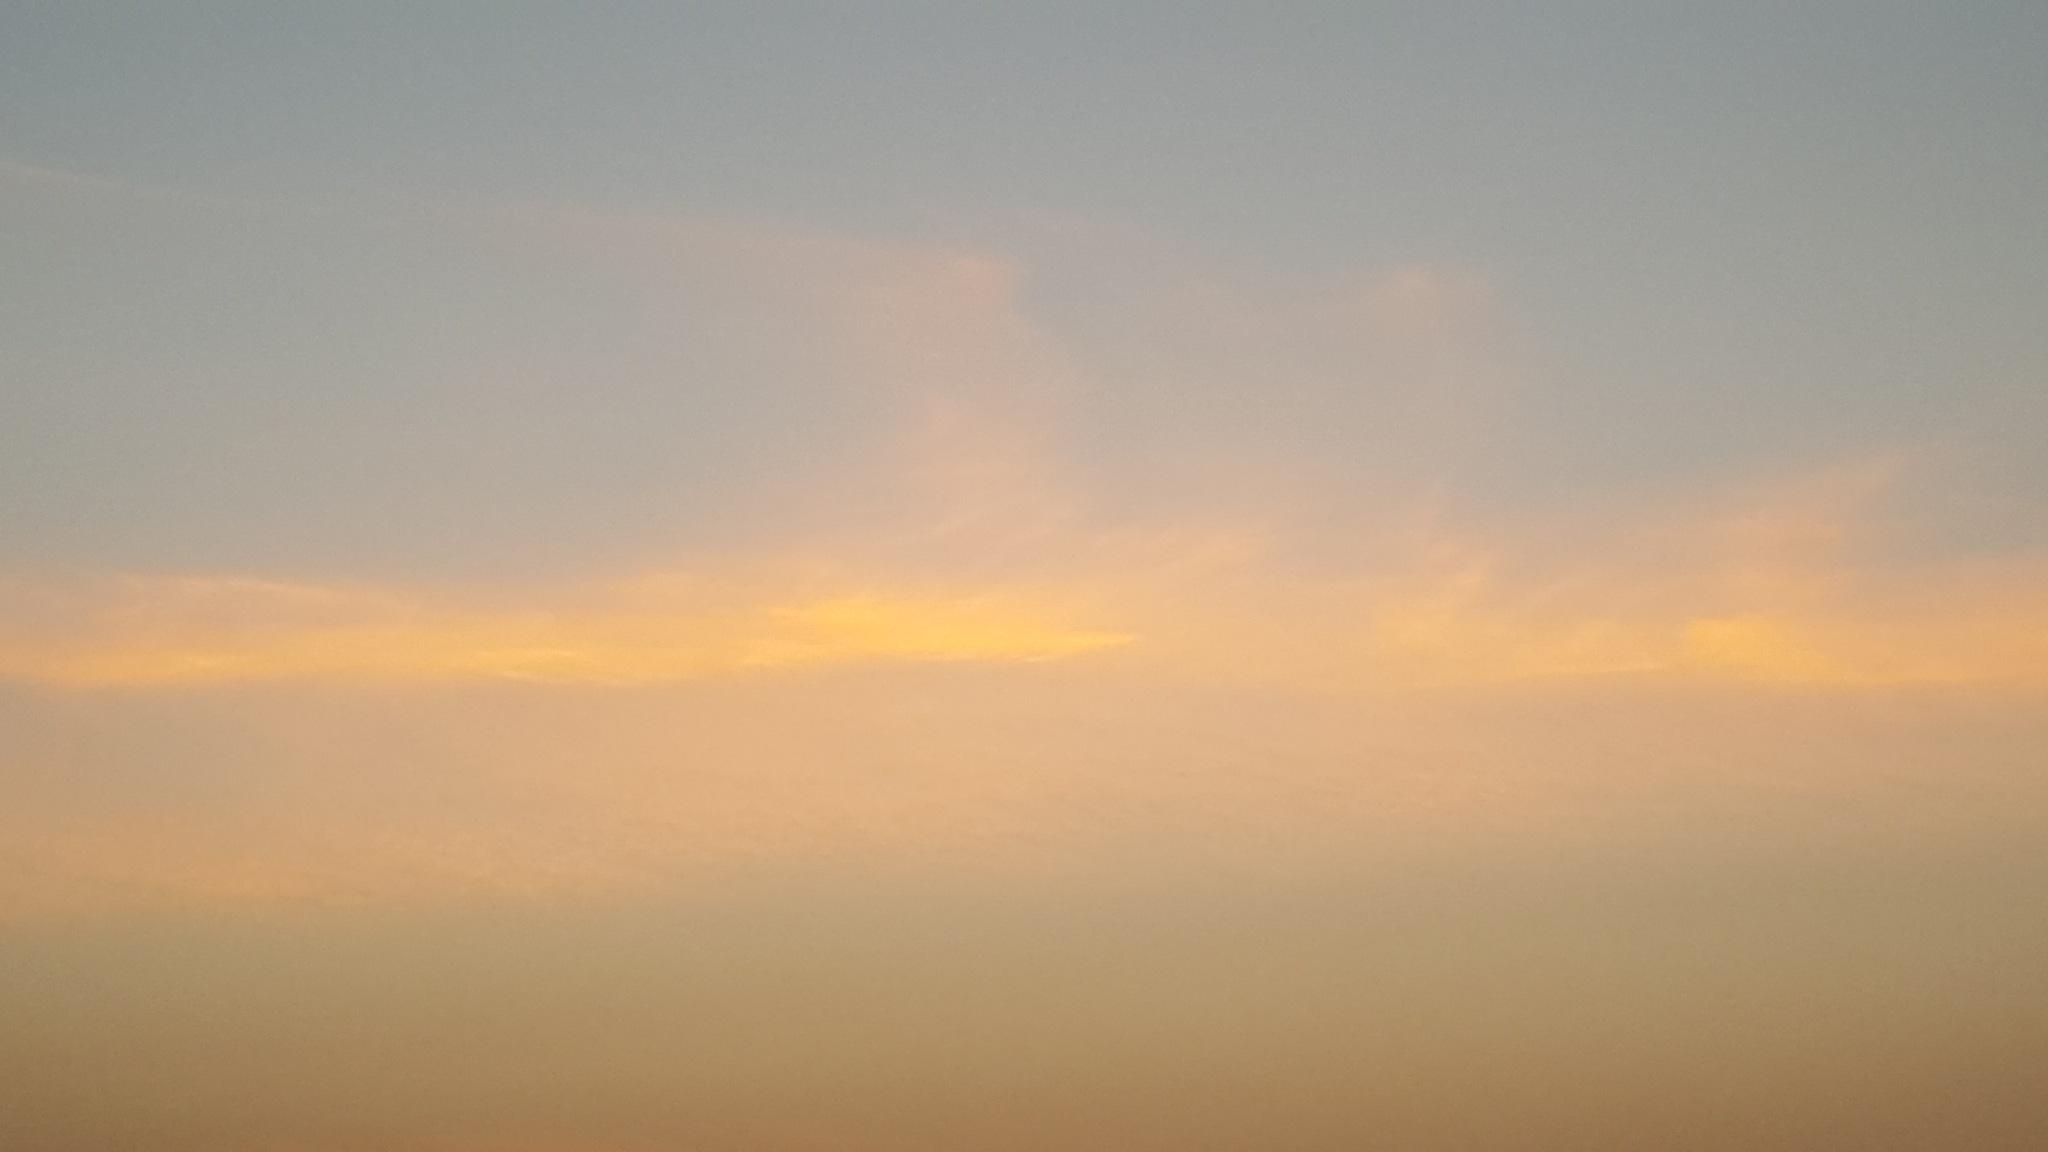 Morning Skies by Joseph Barnett Phiri